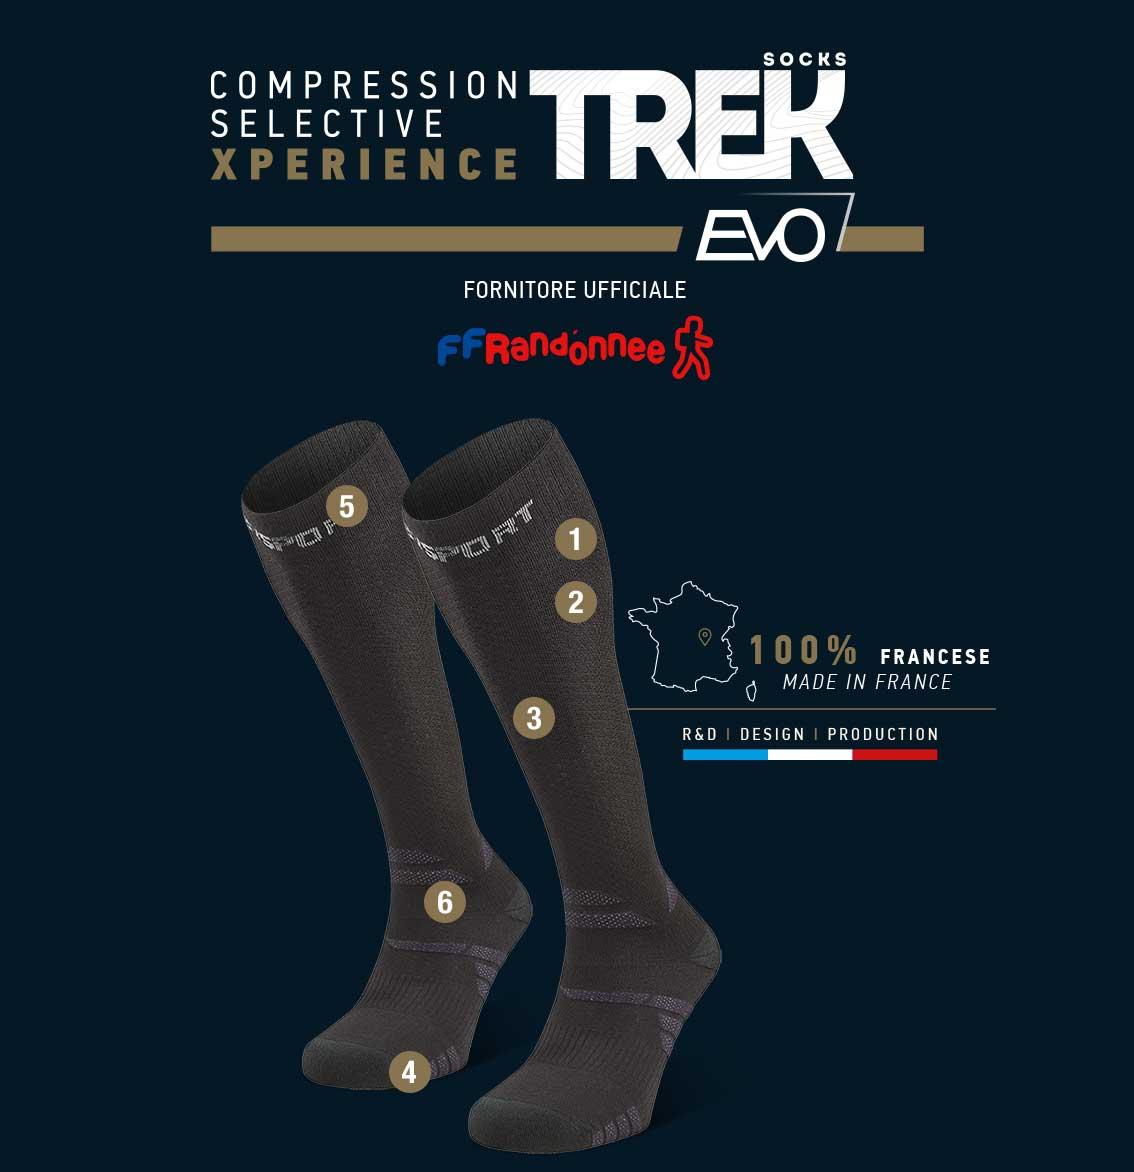 Calza_da_trekking_Trek_compression_EVO_nero-grigio